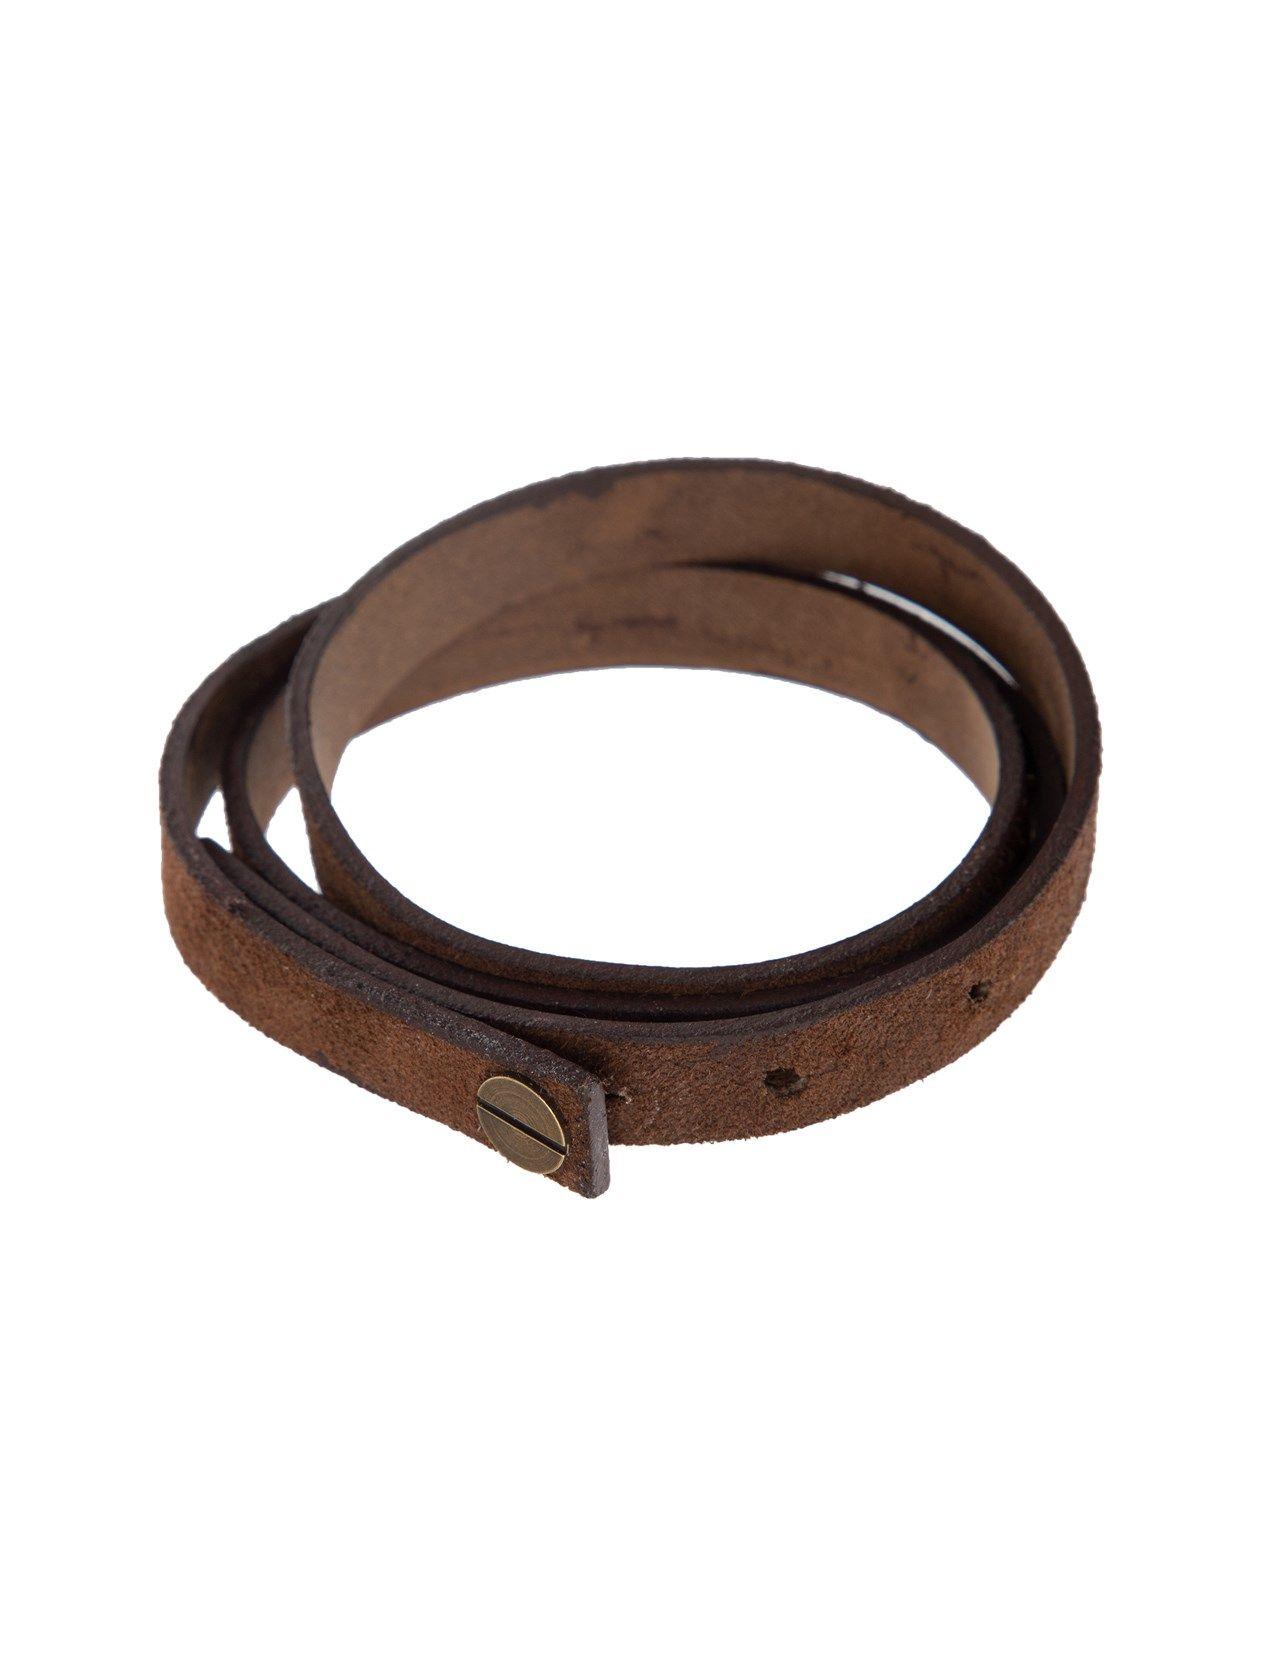 دستبند چرم بزرگسال - چرم لانکا تک سایز - قهوه اي - 4